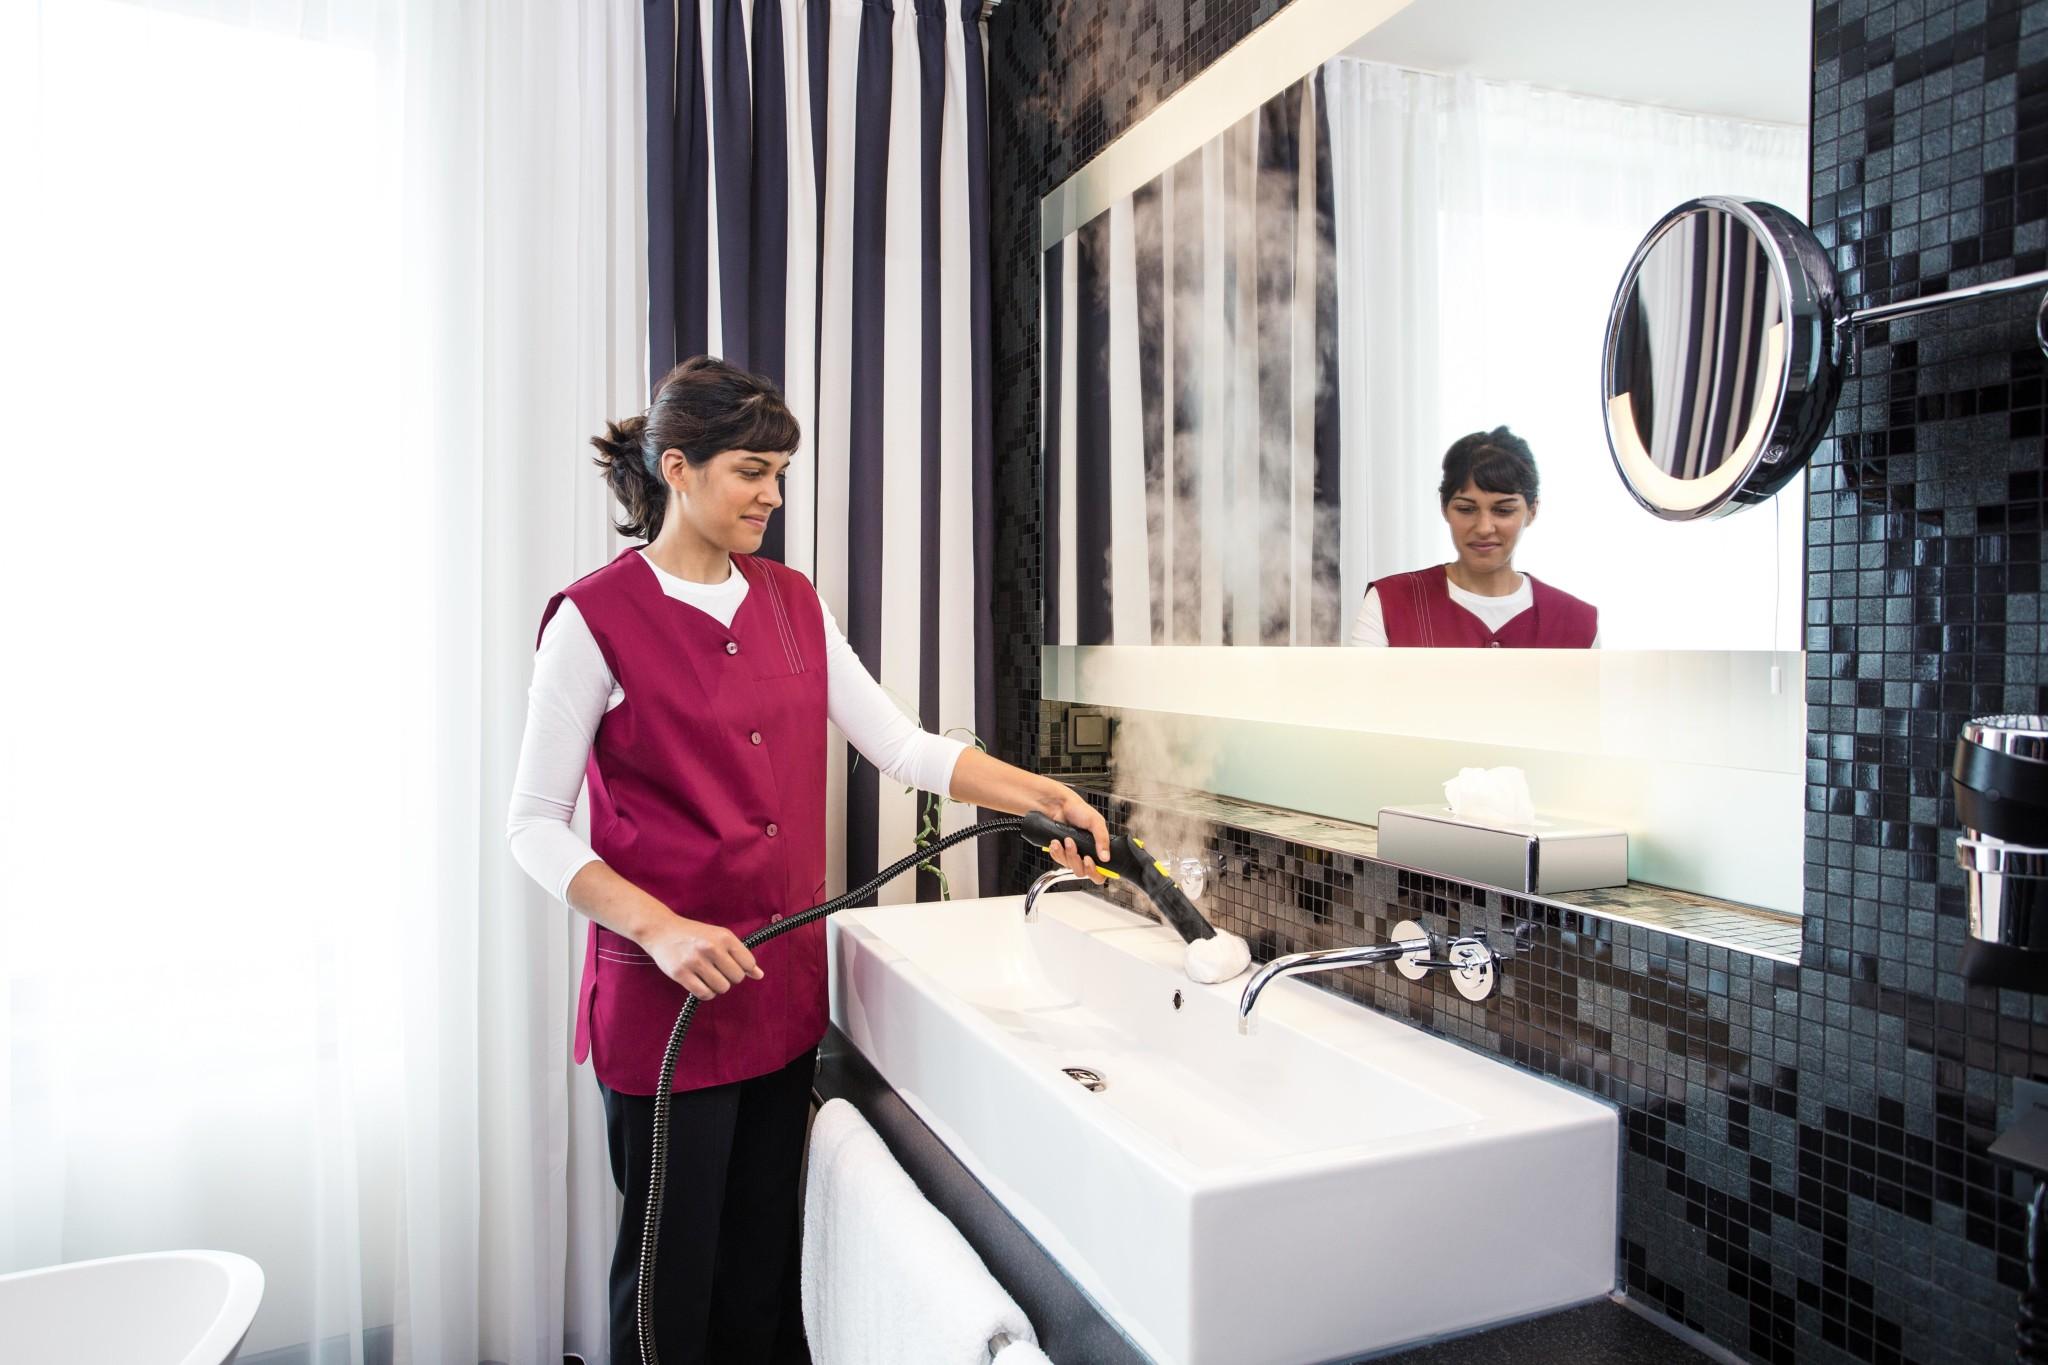 SG_4_4_hospitality_hotel_bathroom_app_1_CI15-87093-300DPI